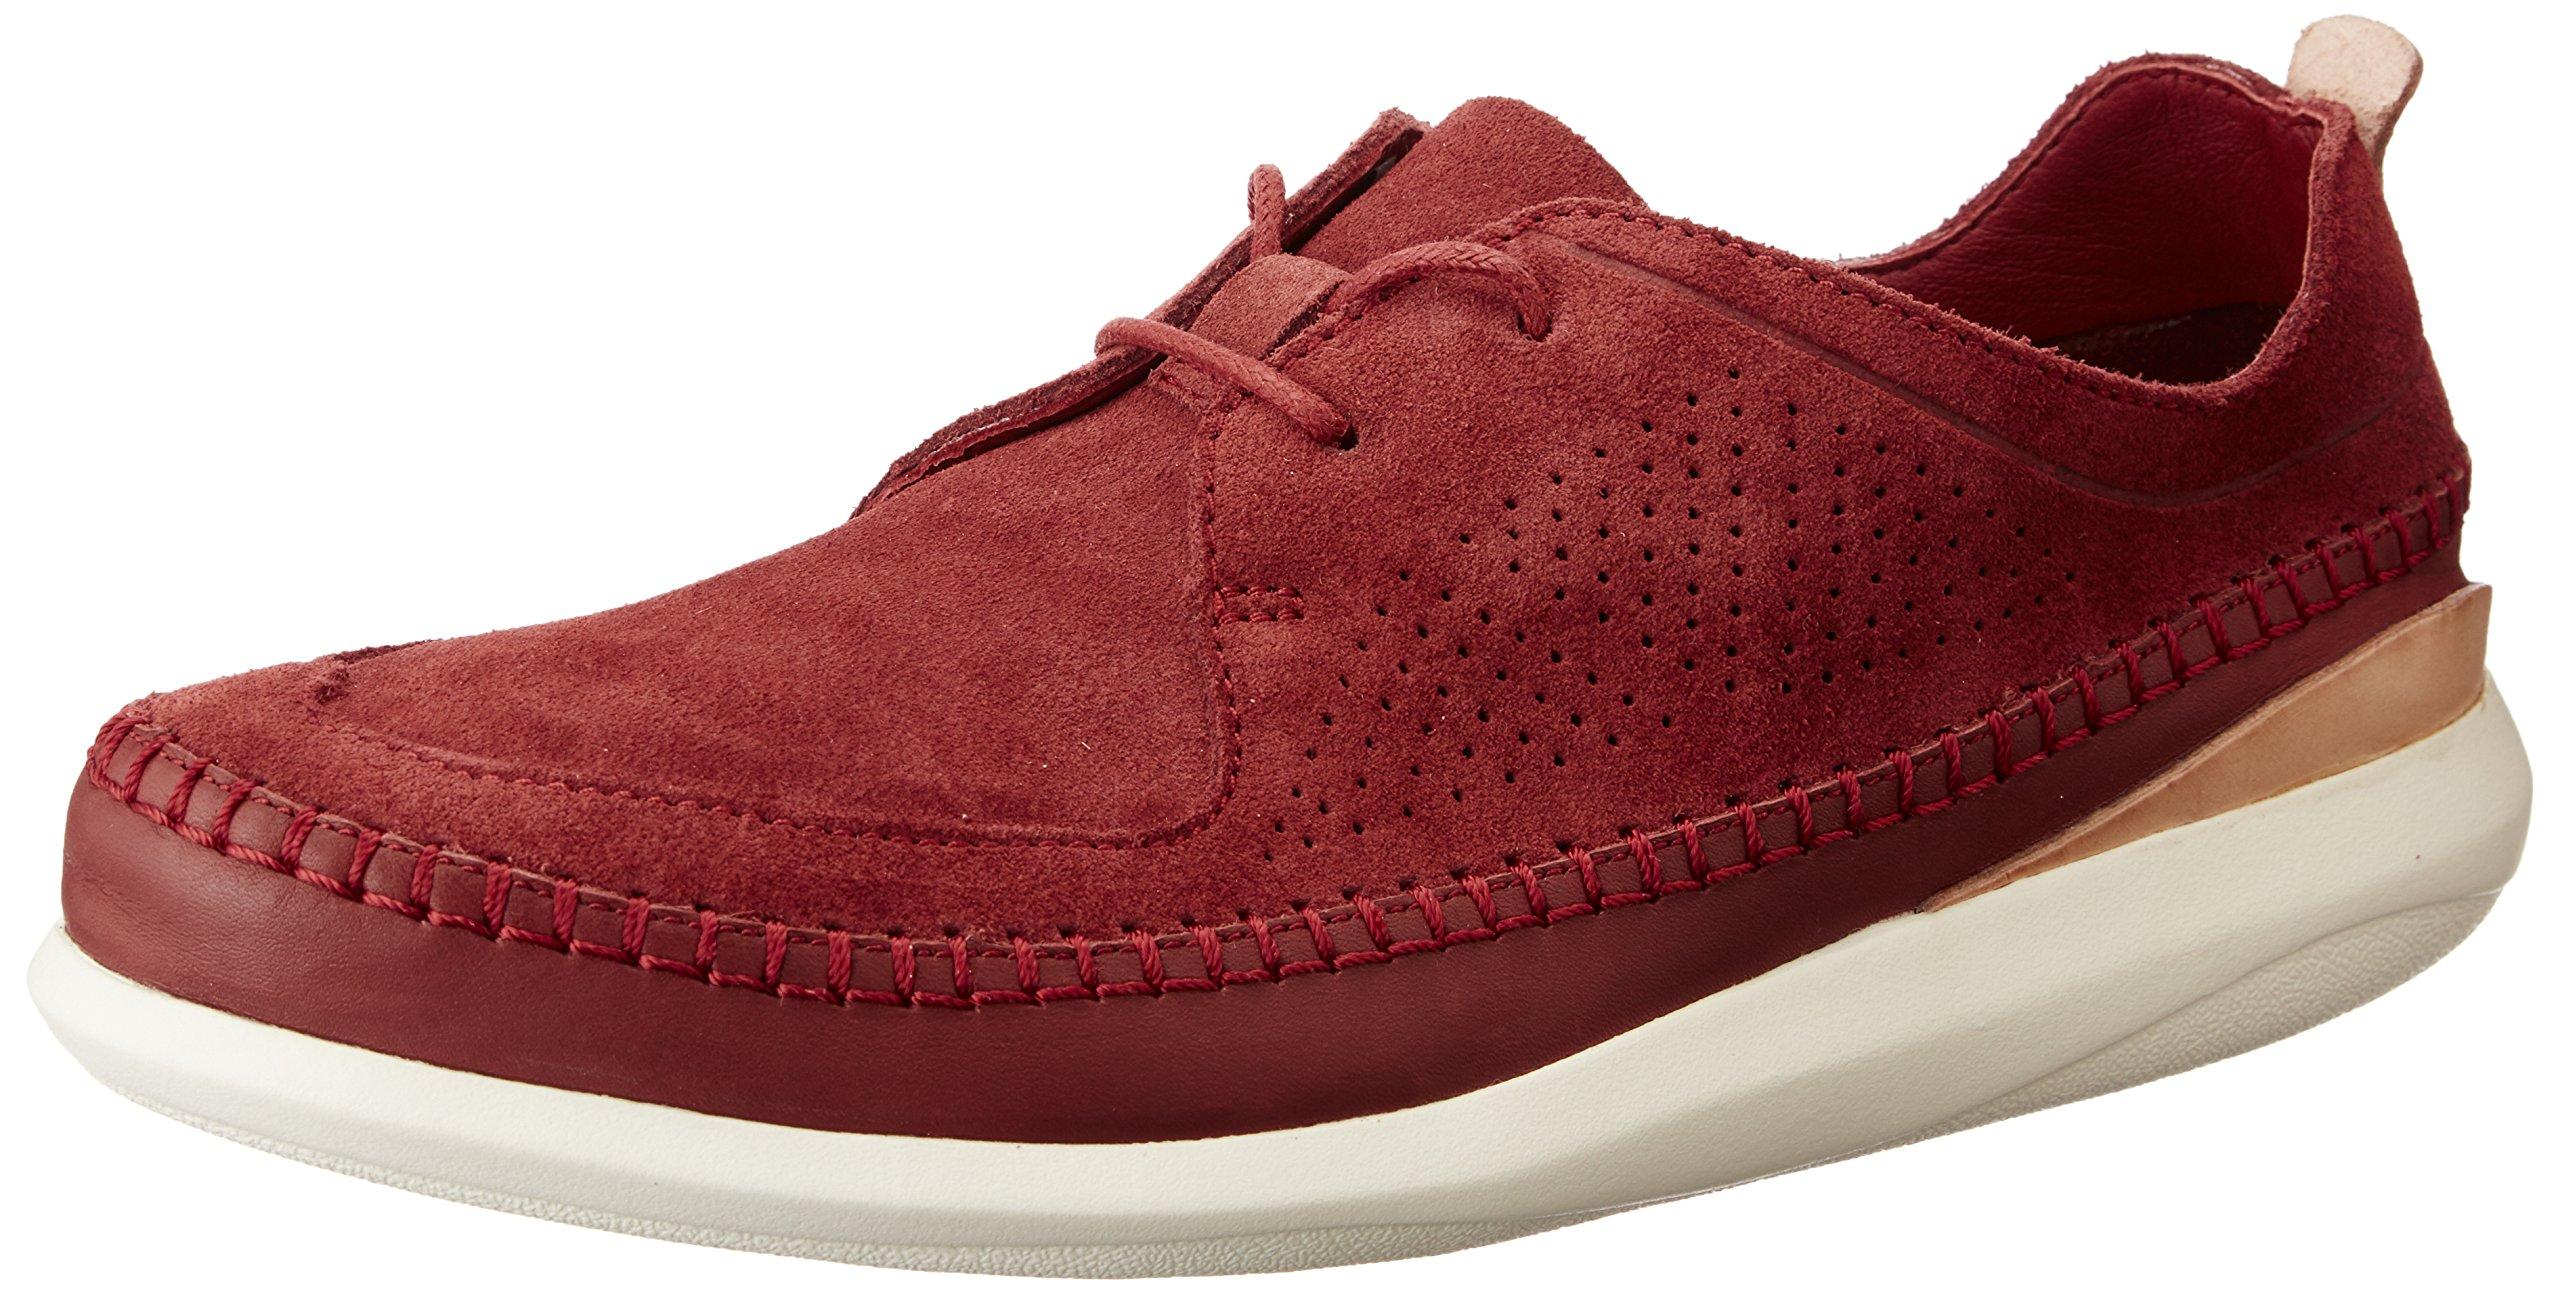 HommeMarronbrick41 Pitman Eu Clarks Basses Free Sneakers kZuOwPXTi